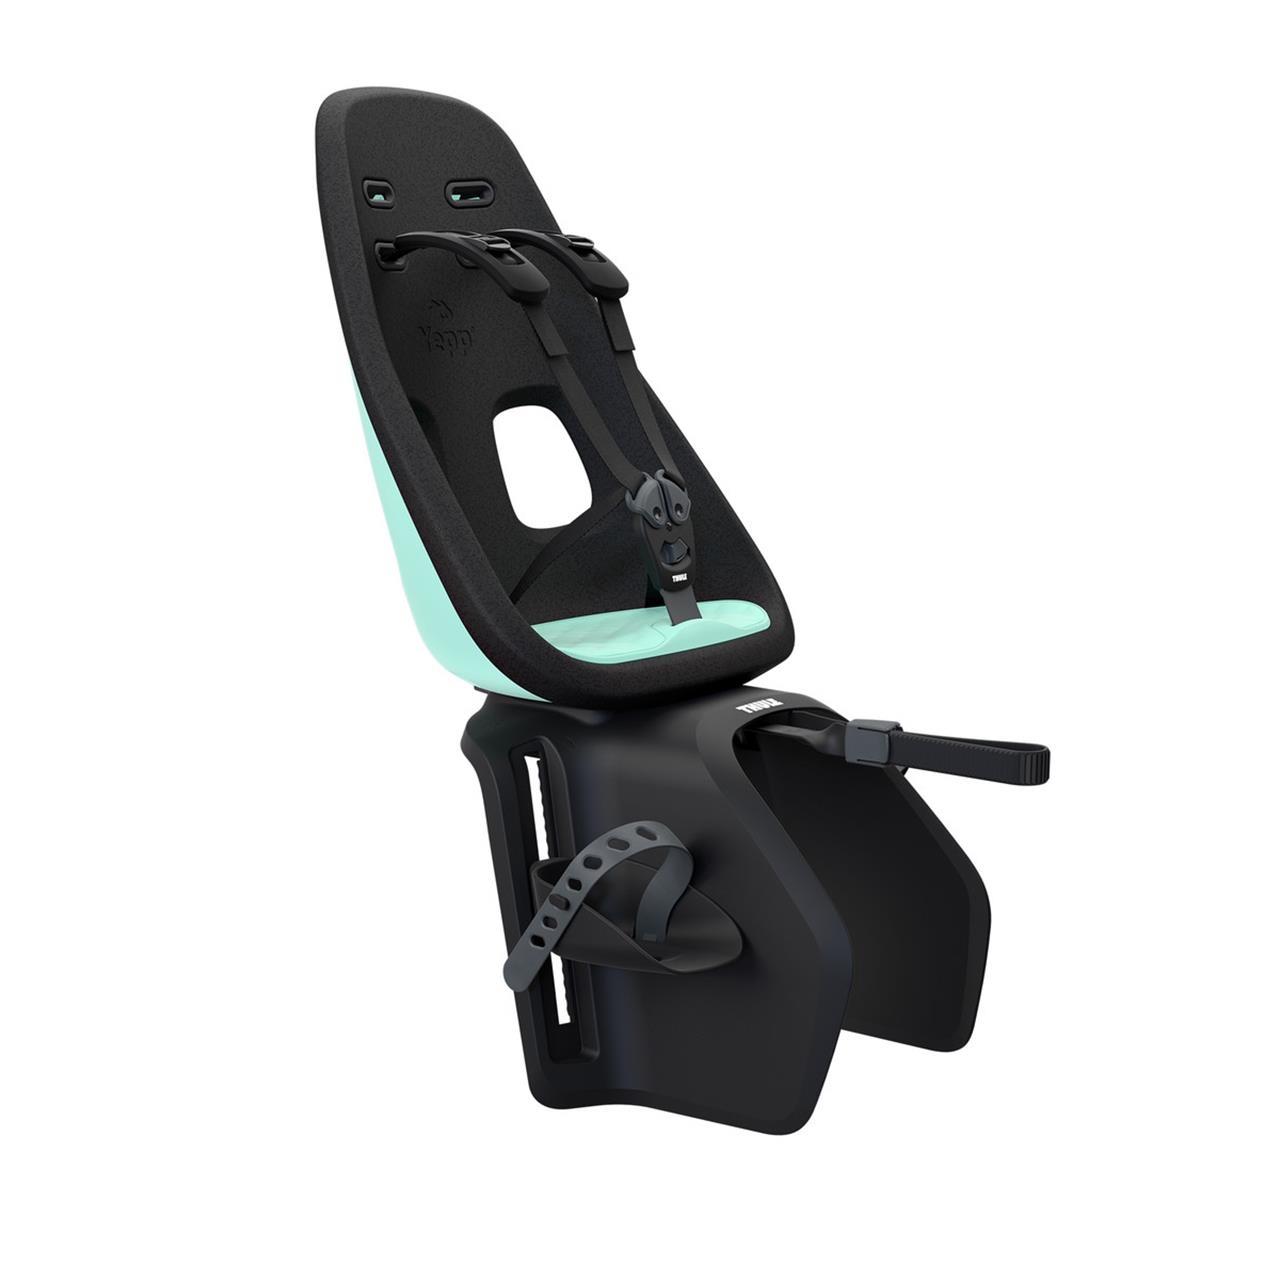 Scaun pentru copii, cu montare pe bicicleta in spate - Thule Yepp Nexxt Maxi Mint Green imagine